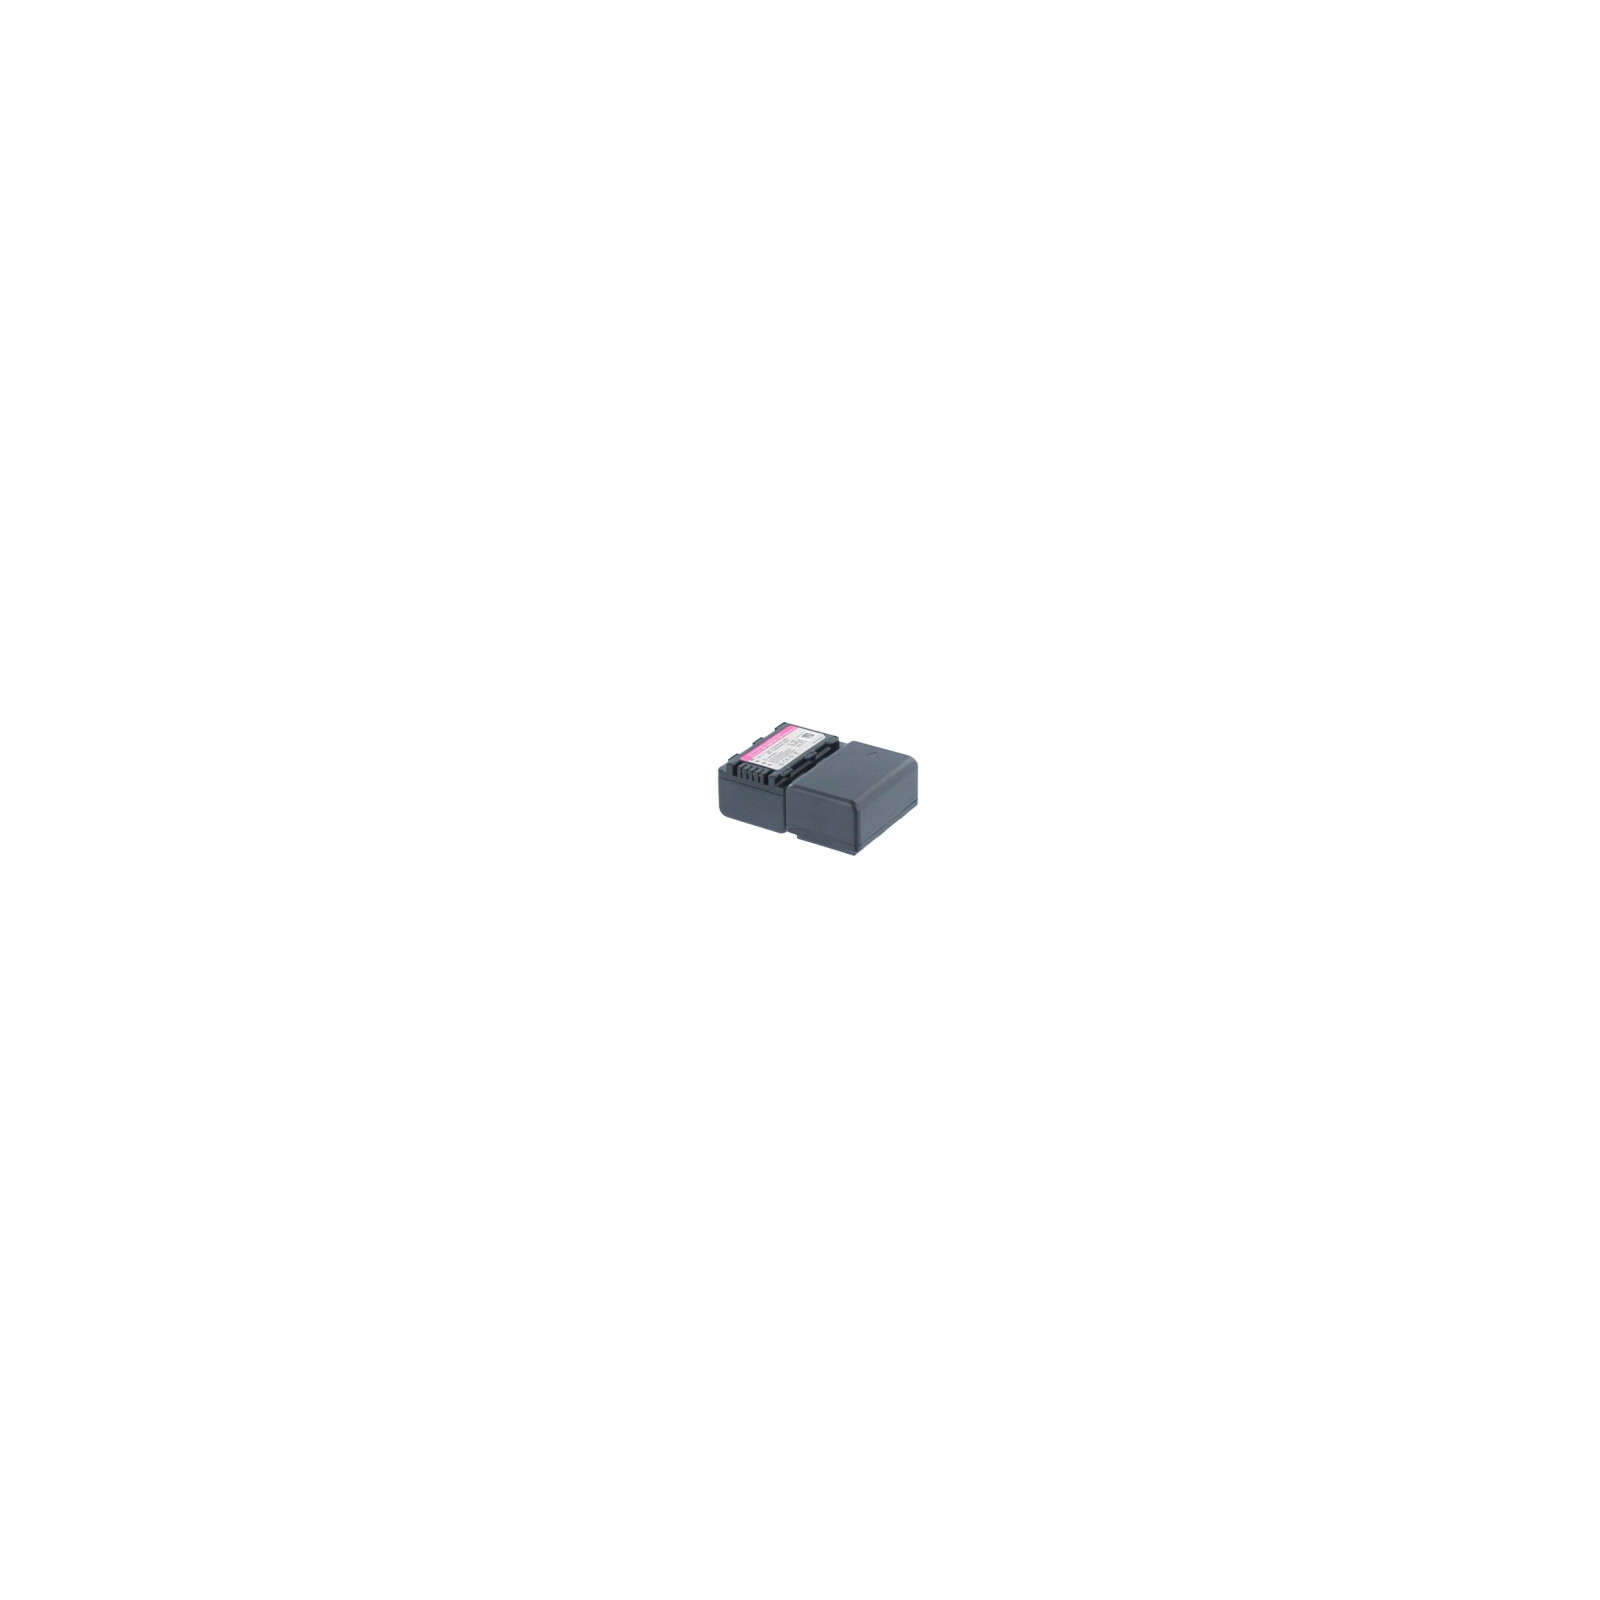 AGI 9225 Akku Panasonic HDC-SD66